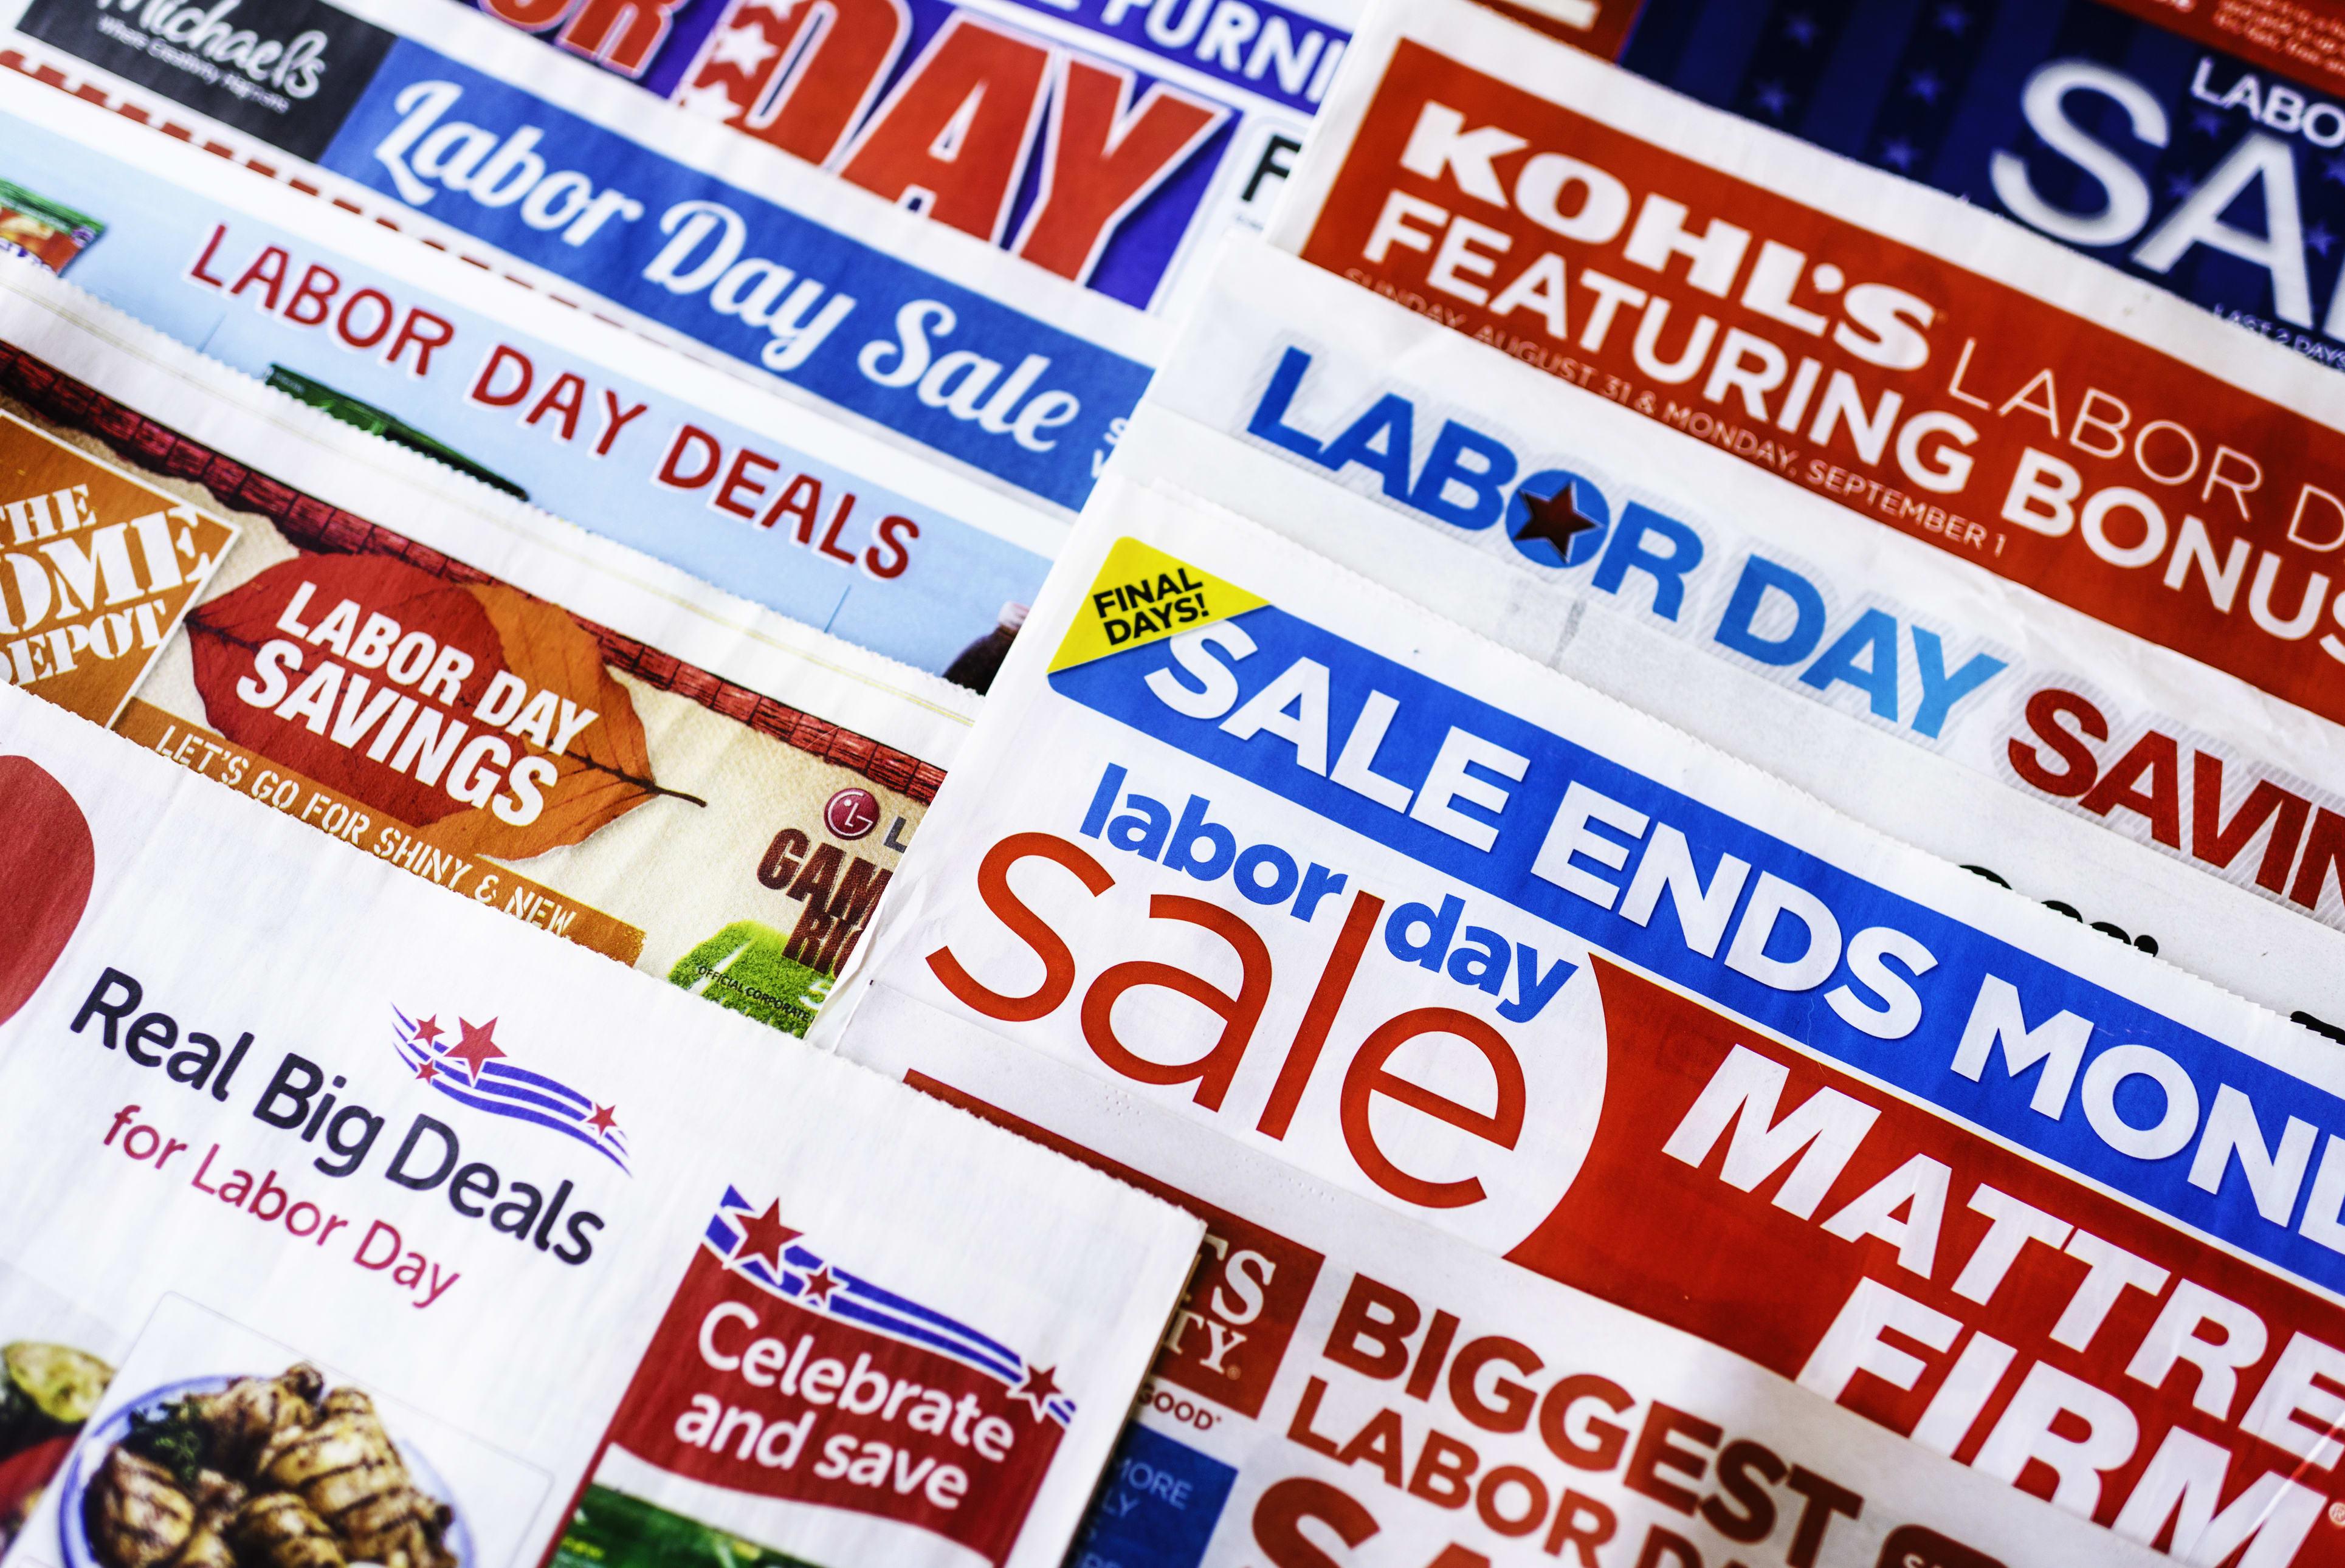 Labor Day sales ads